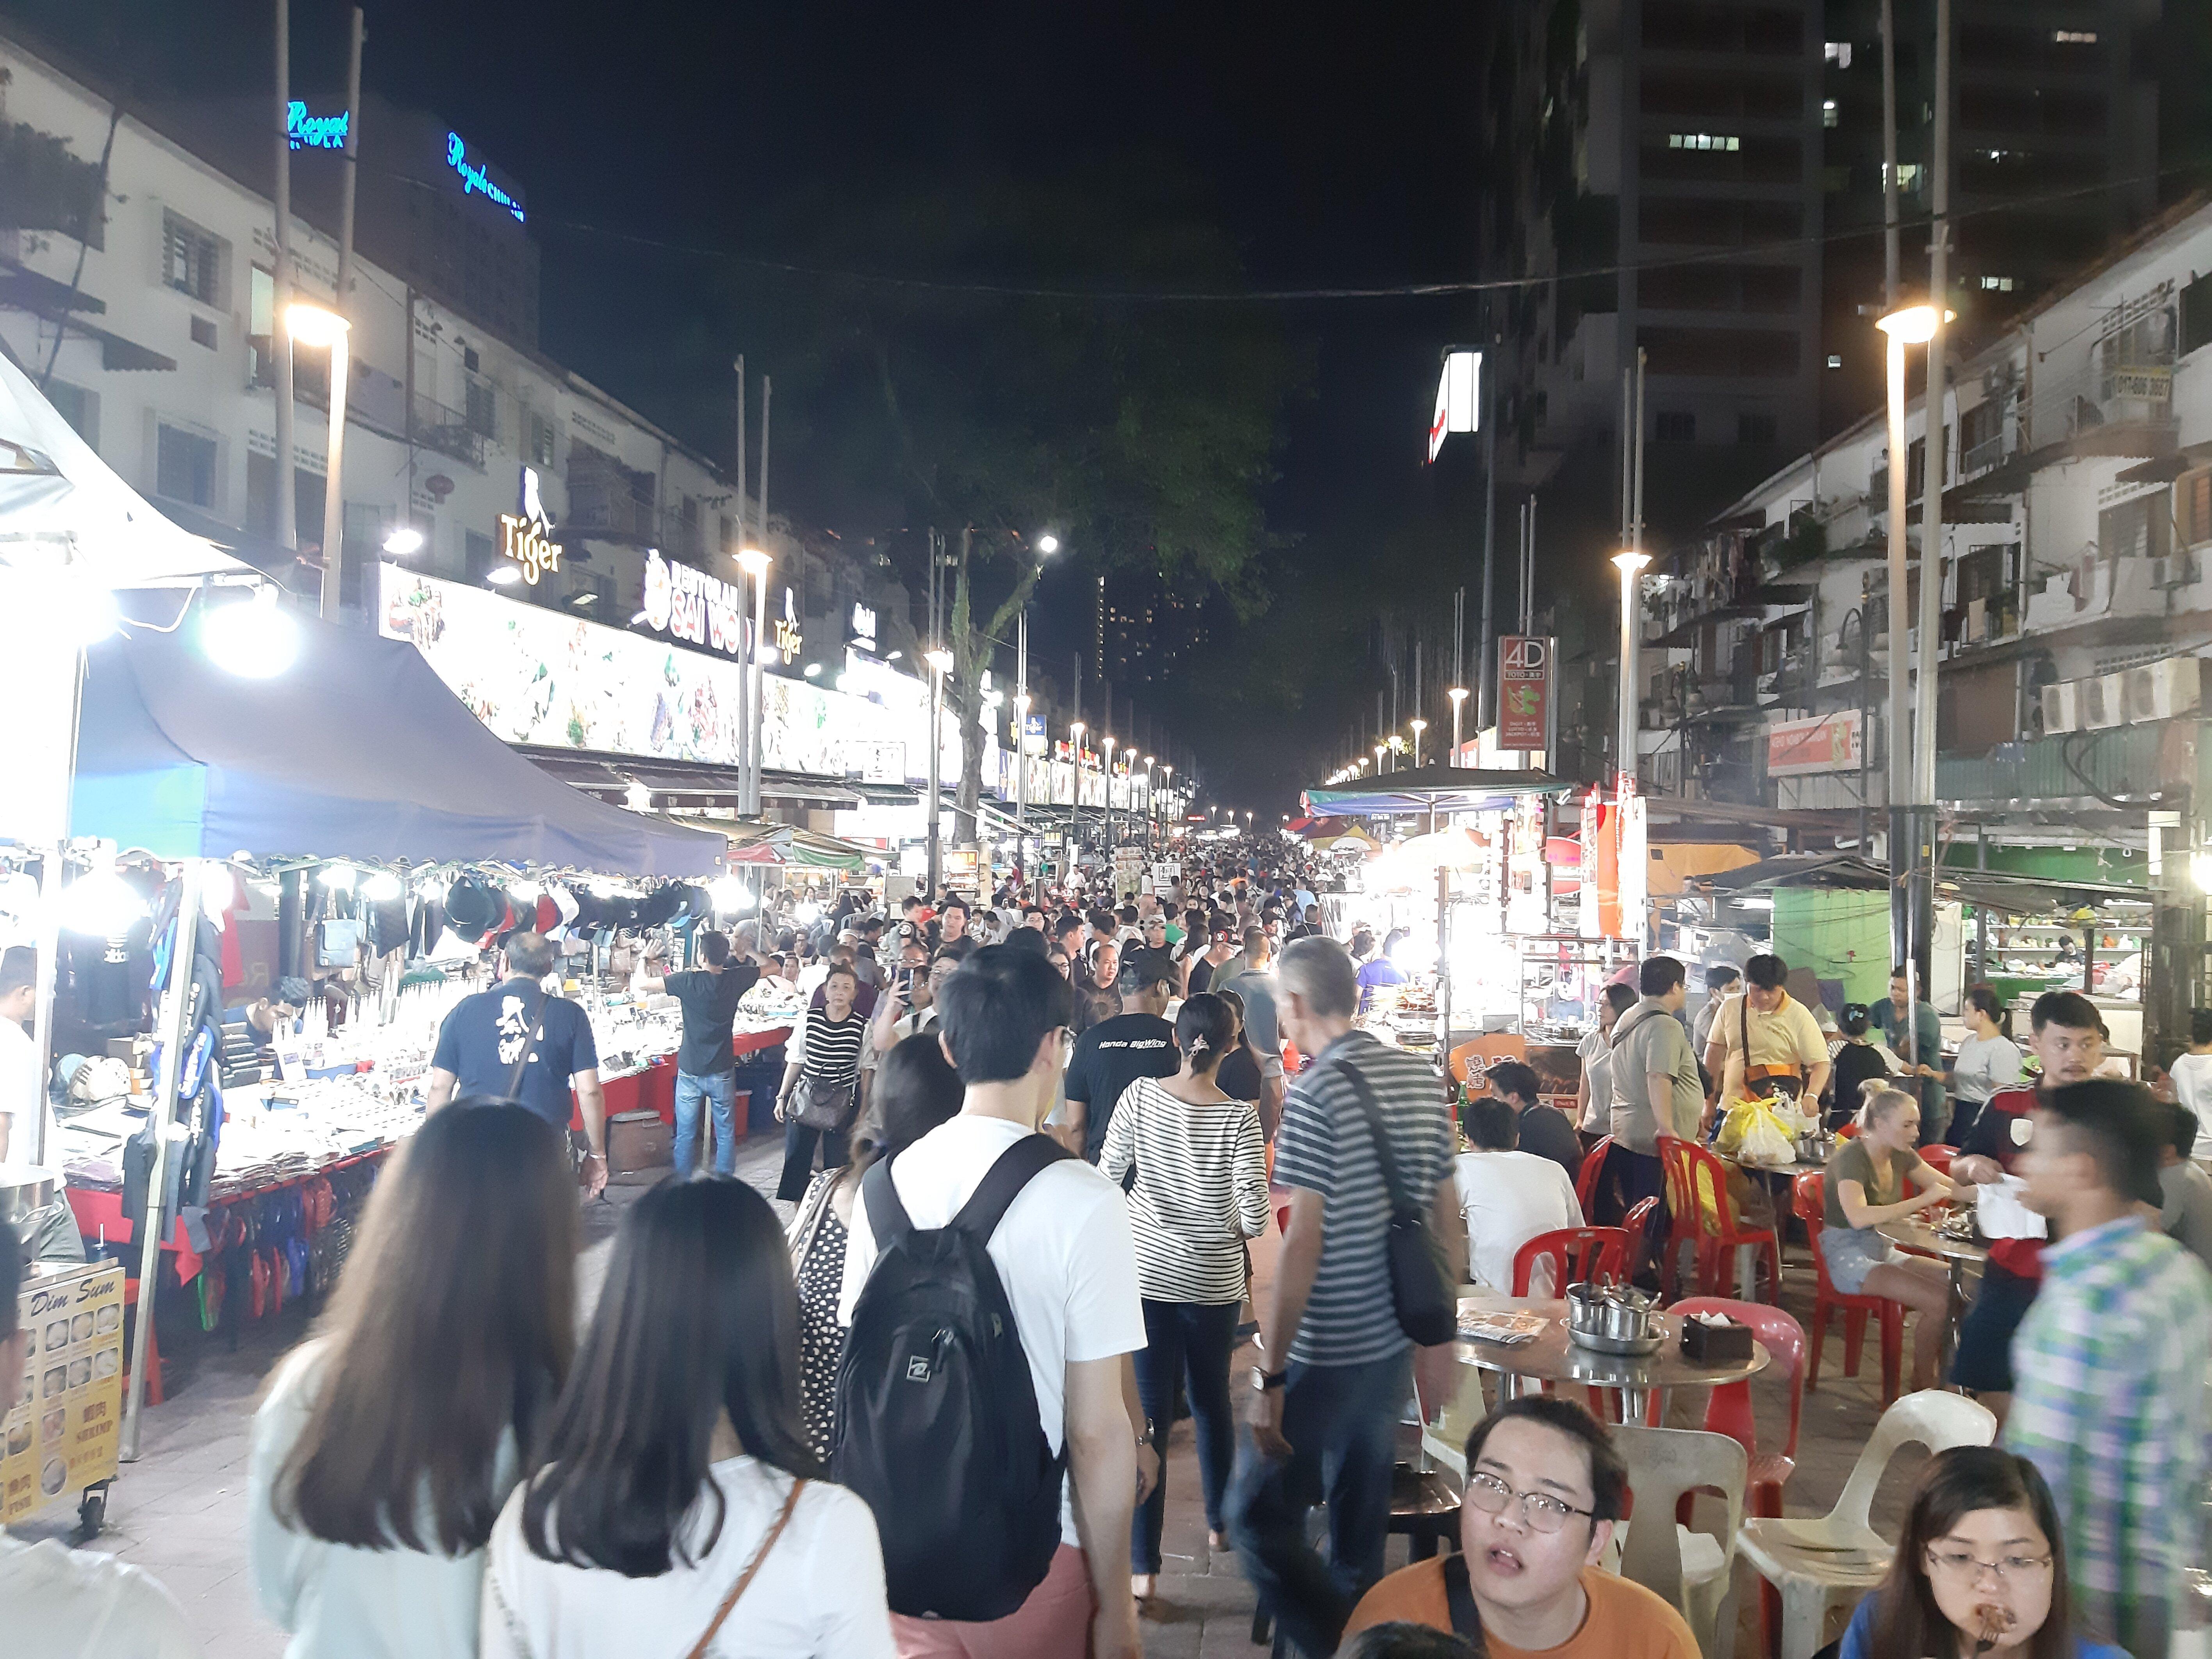 The Jalan Alor night market.